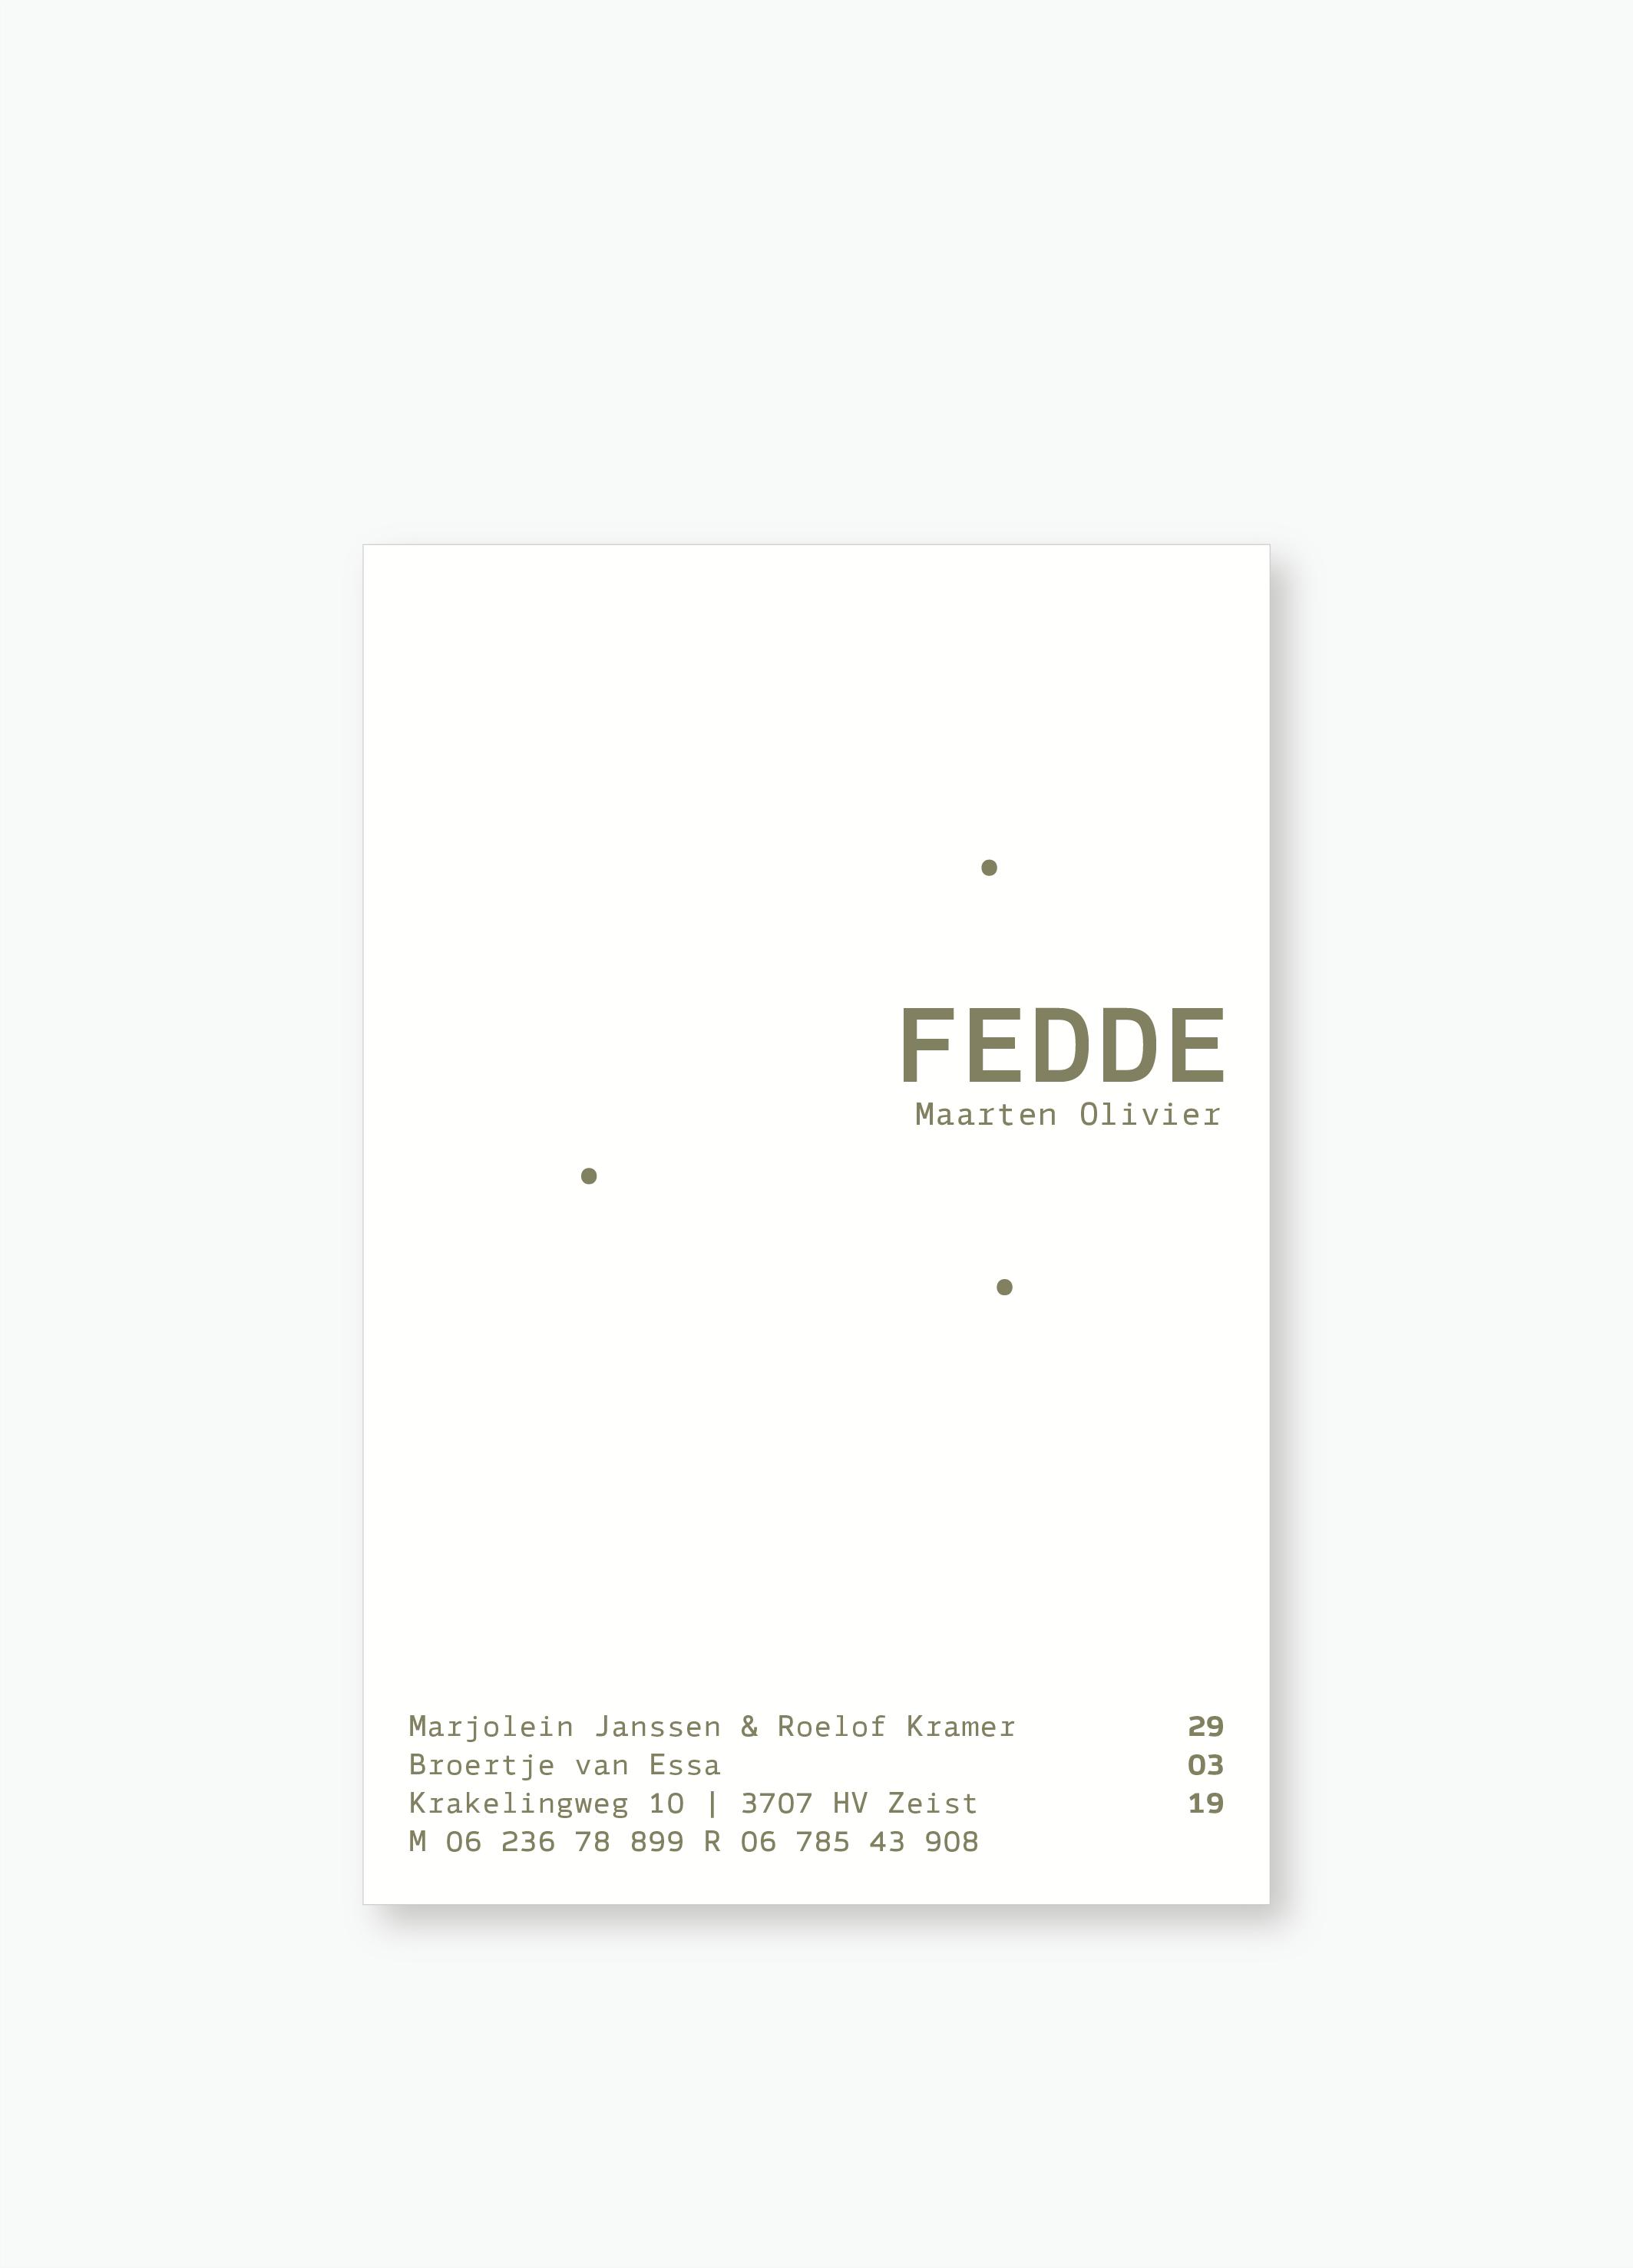 Geboortekaartje Fedde | Studio Moose